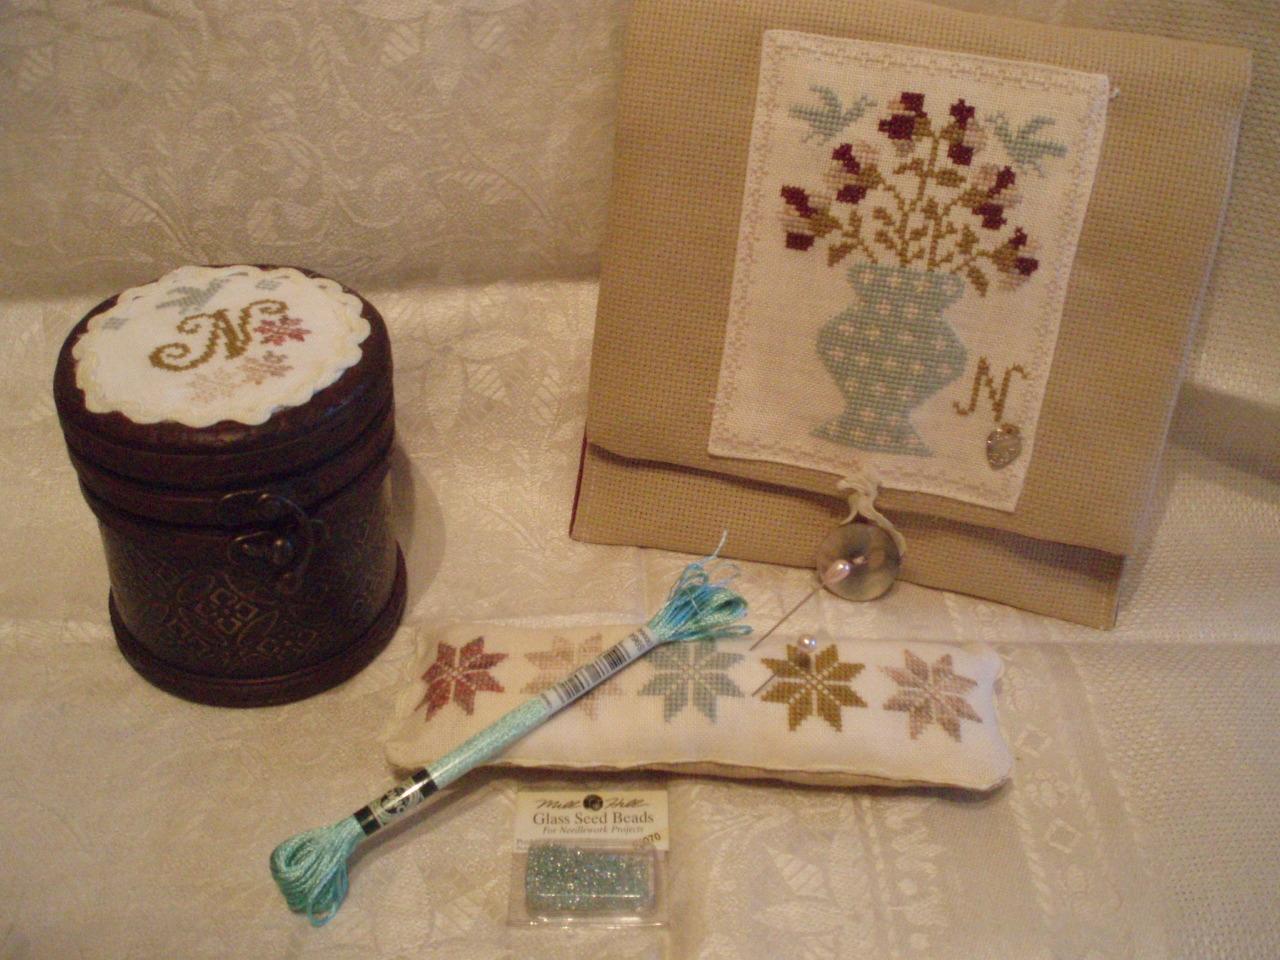 Dmc Thread Cabinet Blackbird Designs Community Blog For Embroiderers Stitchers